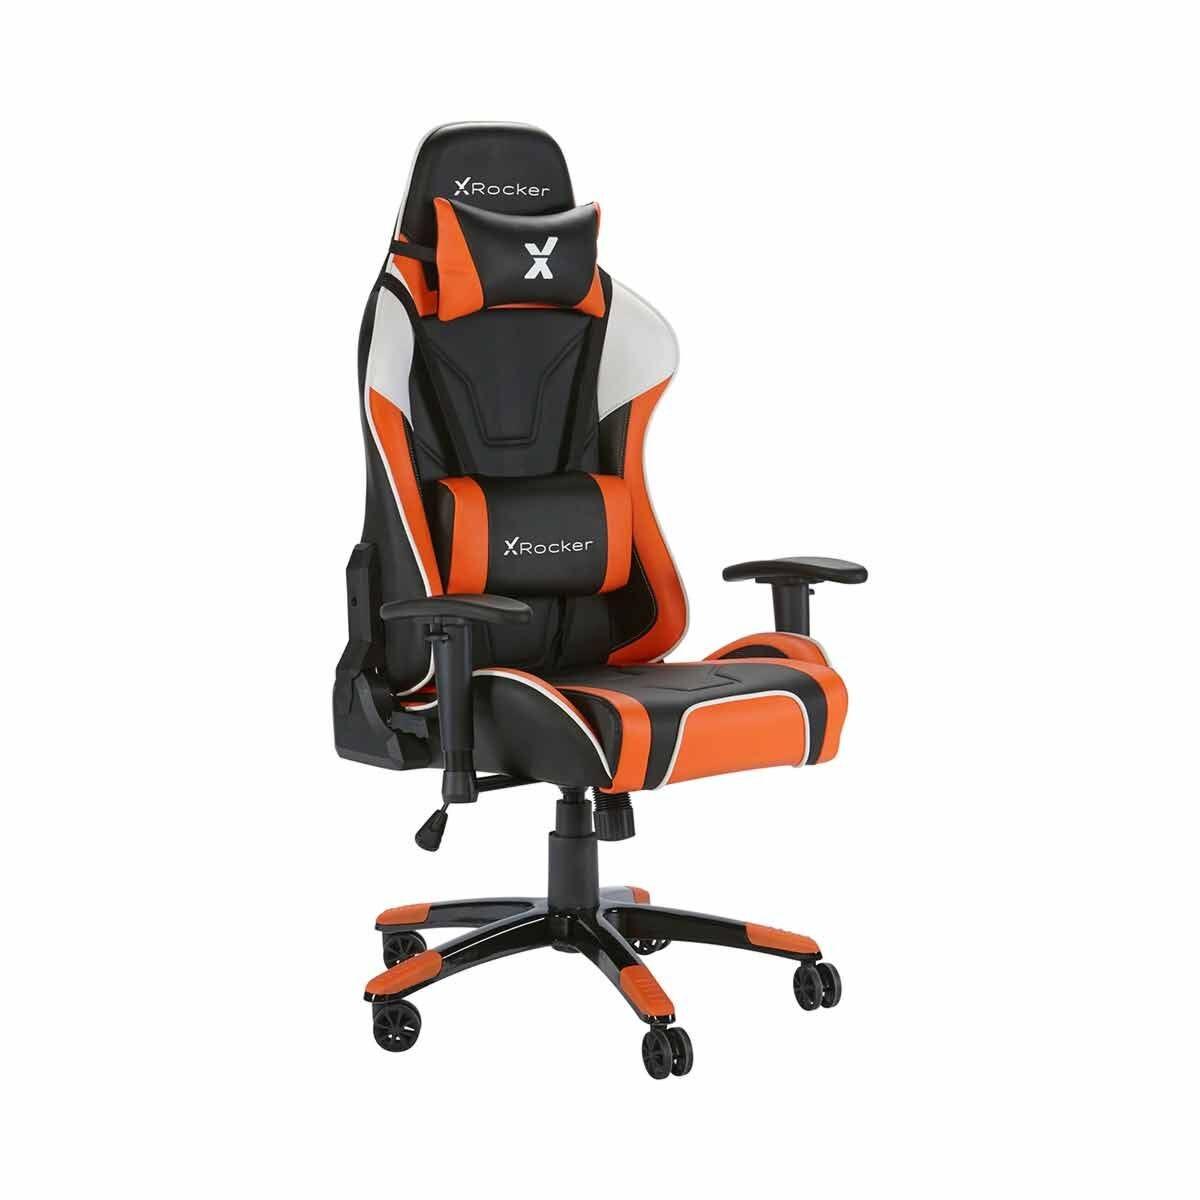 X Rocker Agility eSports Office Gaming Chair